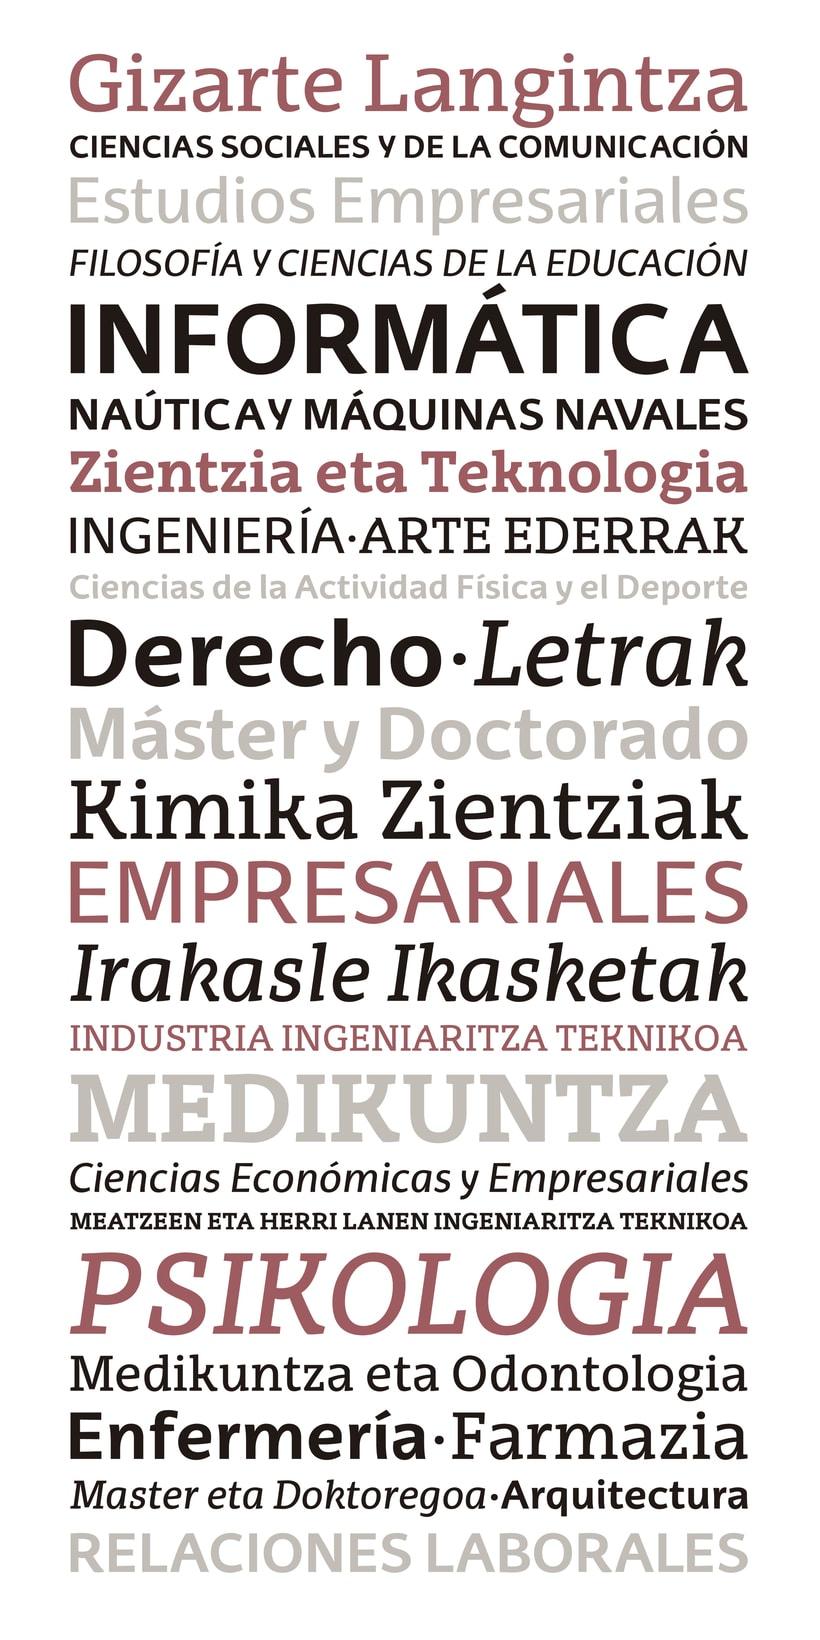 EHU Tipografía corporativa 1